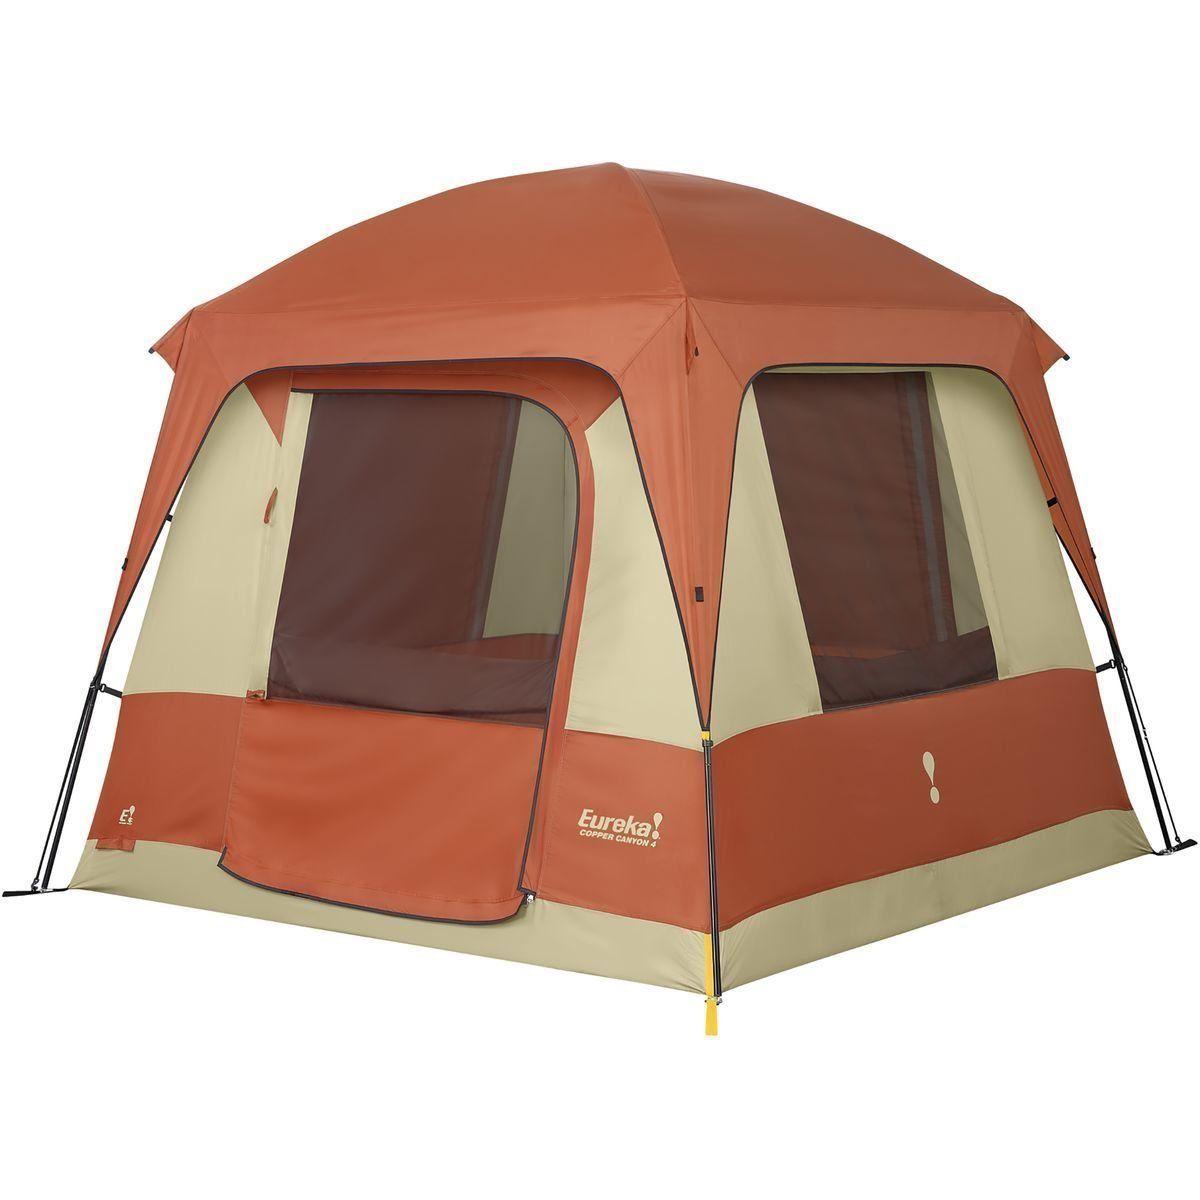 Eureka Copper Canyon 4 8 x 8 Tent  sc 1 st  Pinterest & tent pop up tent tents for sale camping tents coleman tents ...